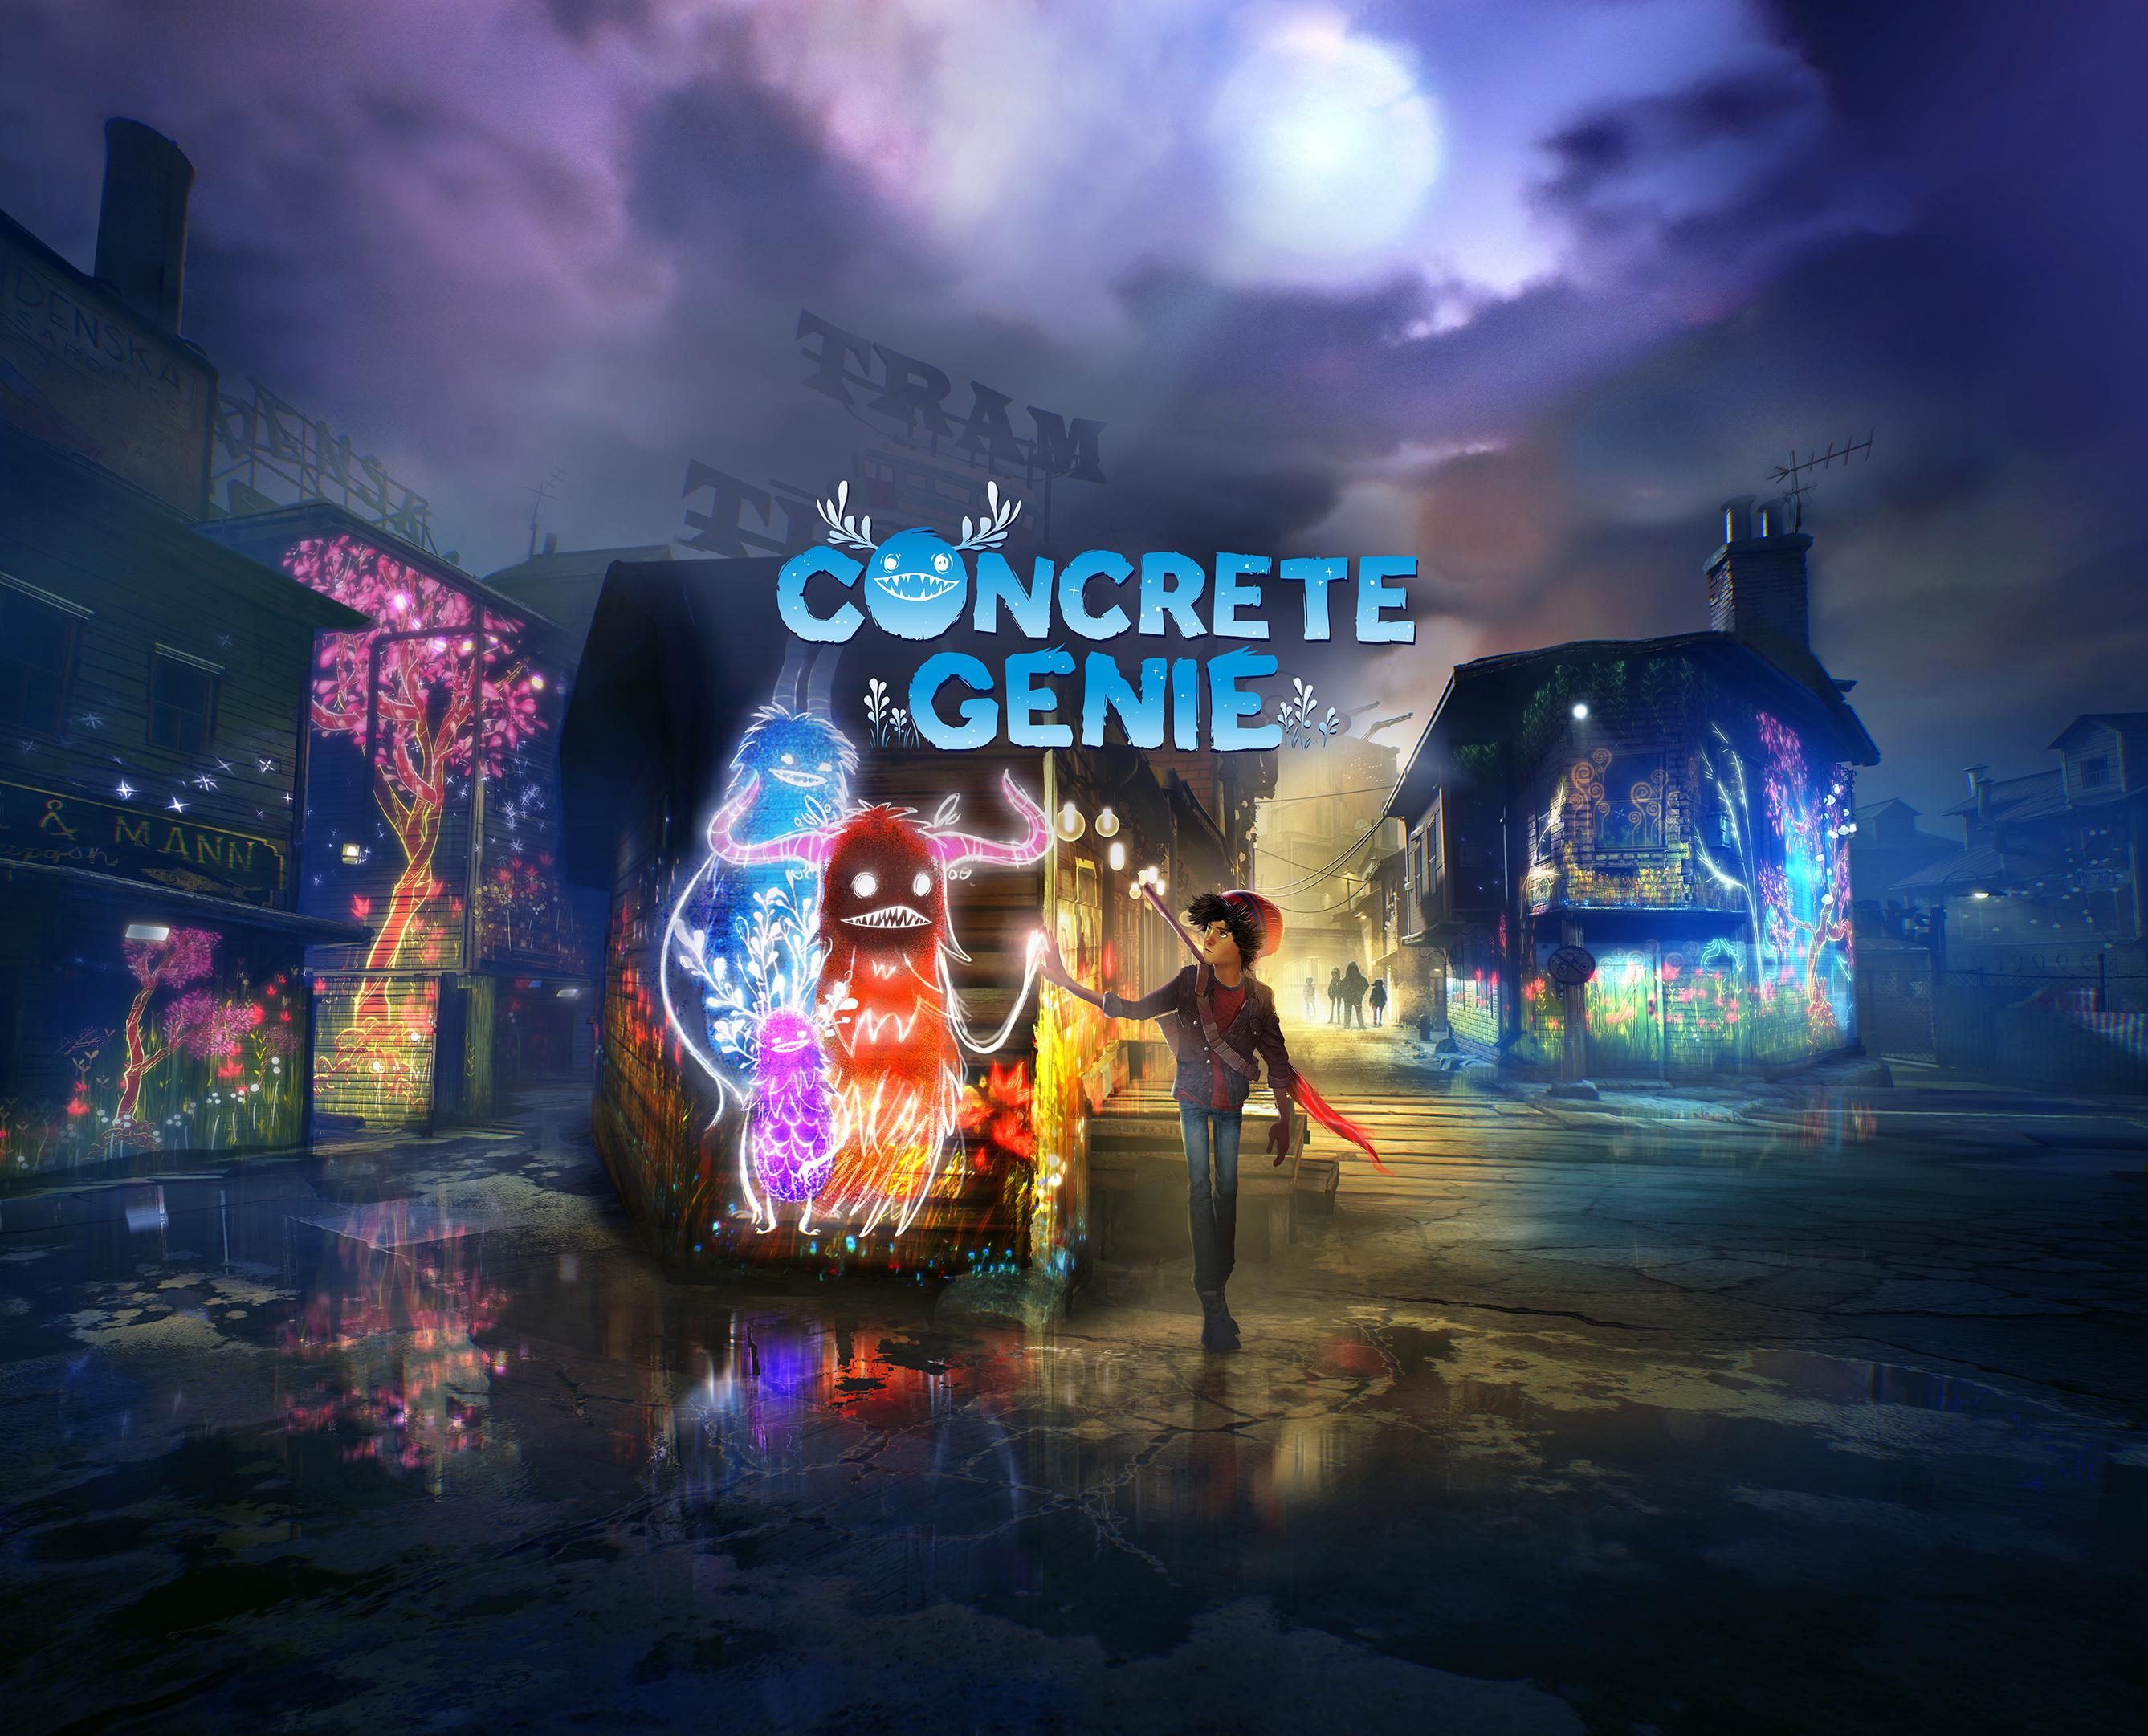 Concrete Genie Wallpaper, HD Games 4K Wallpapers, Images